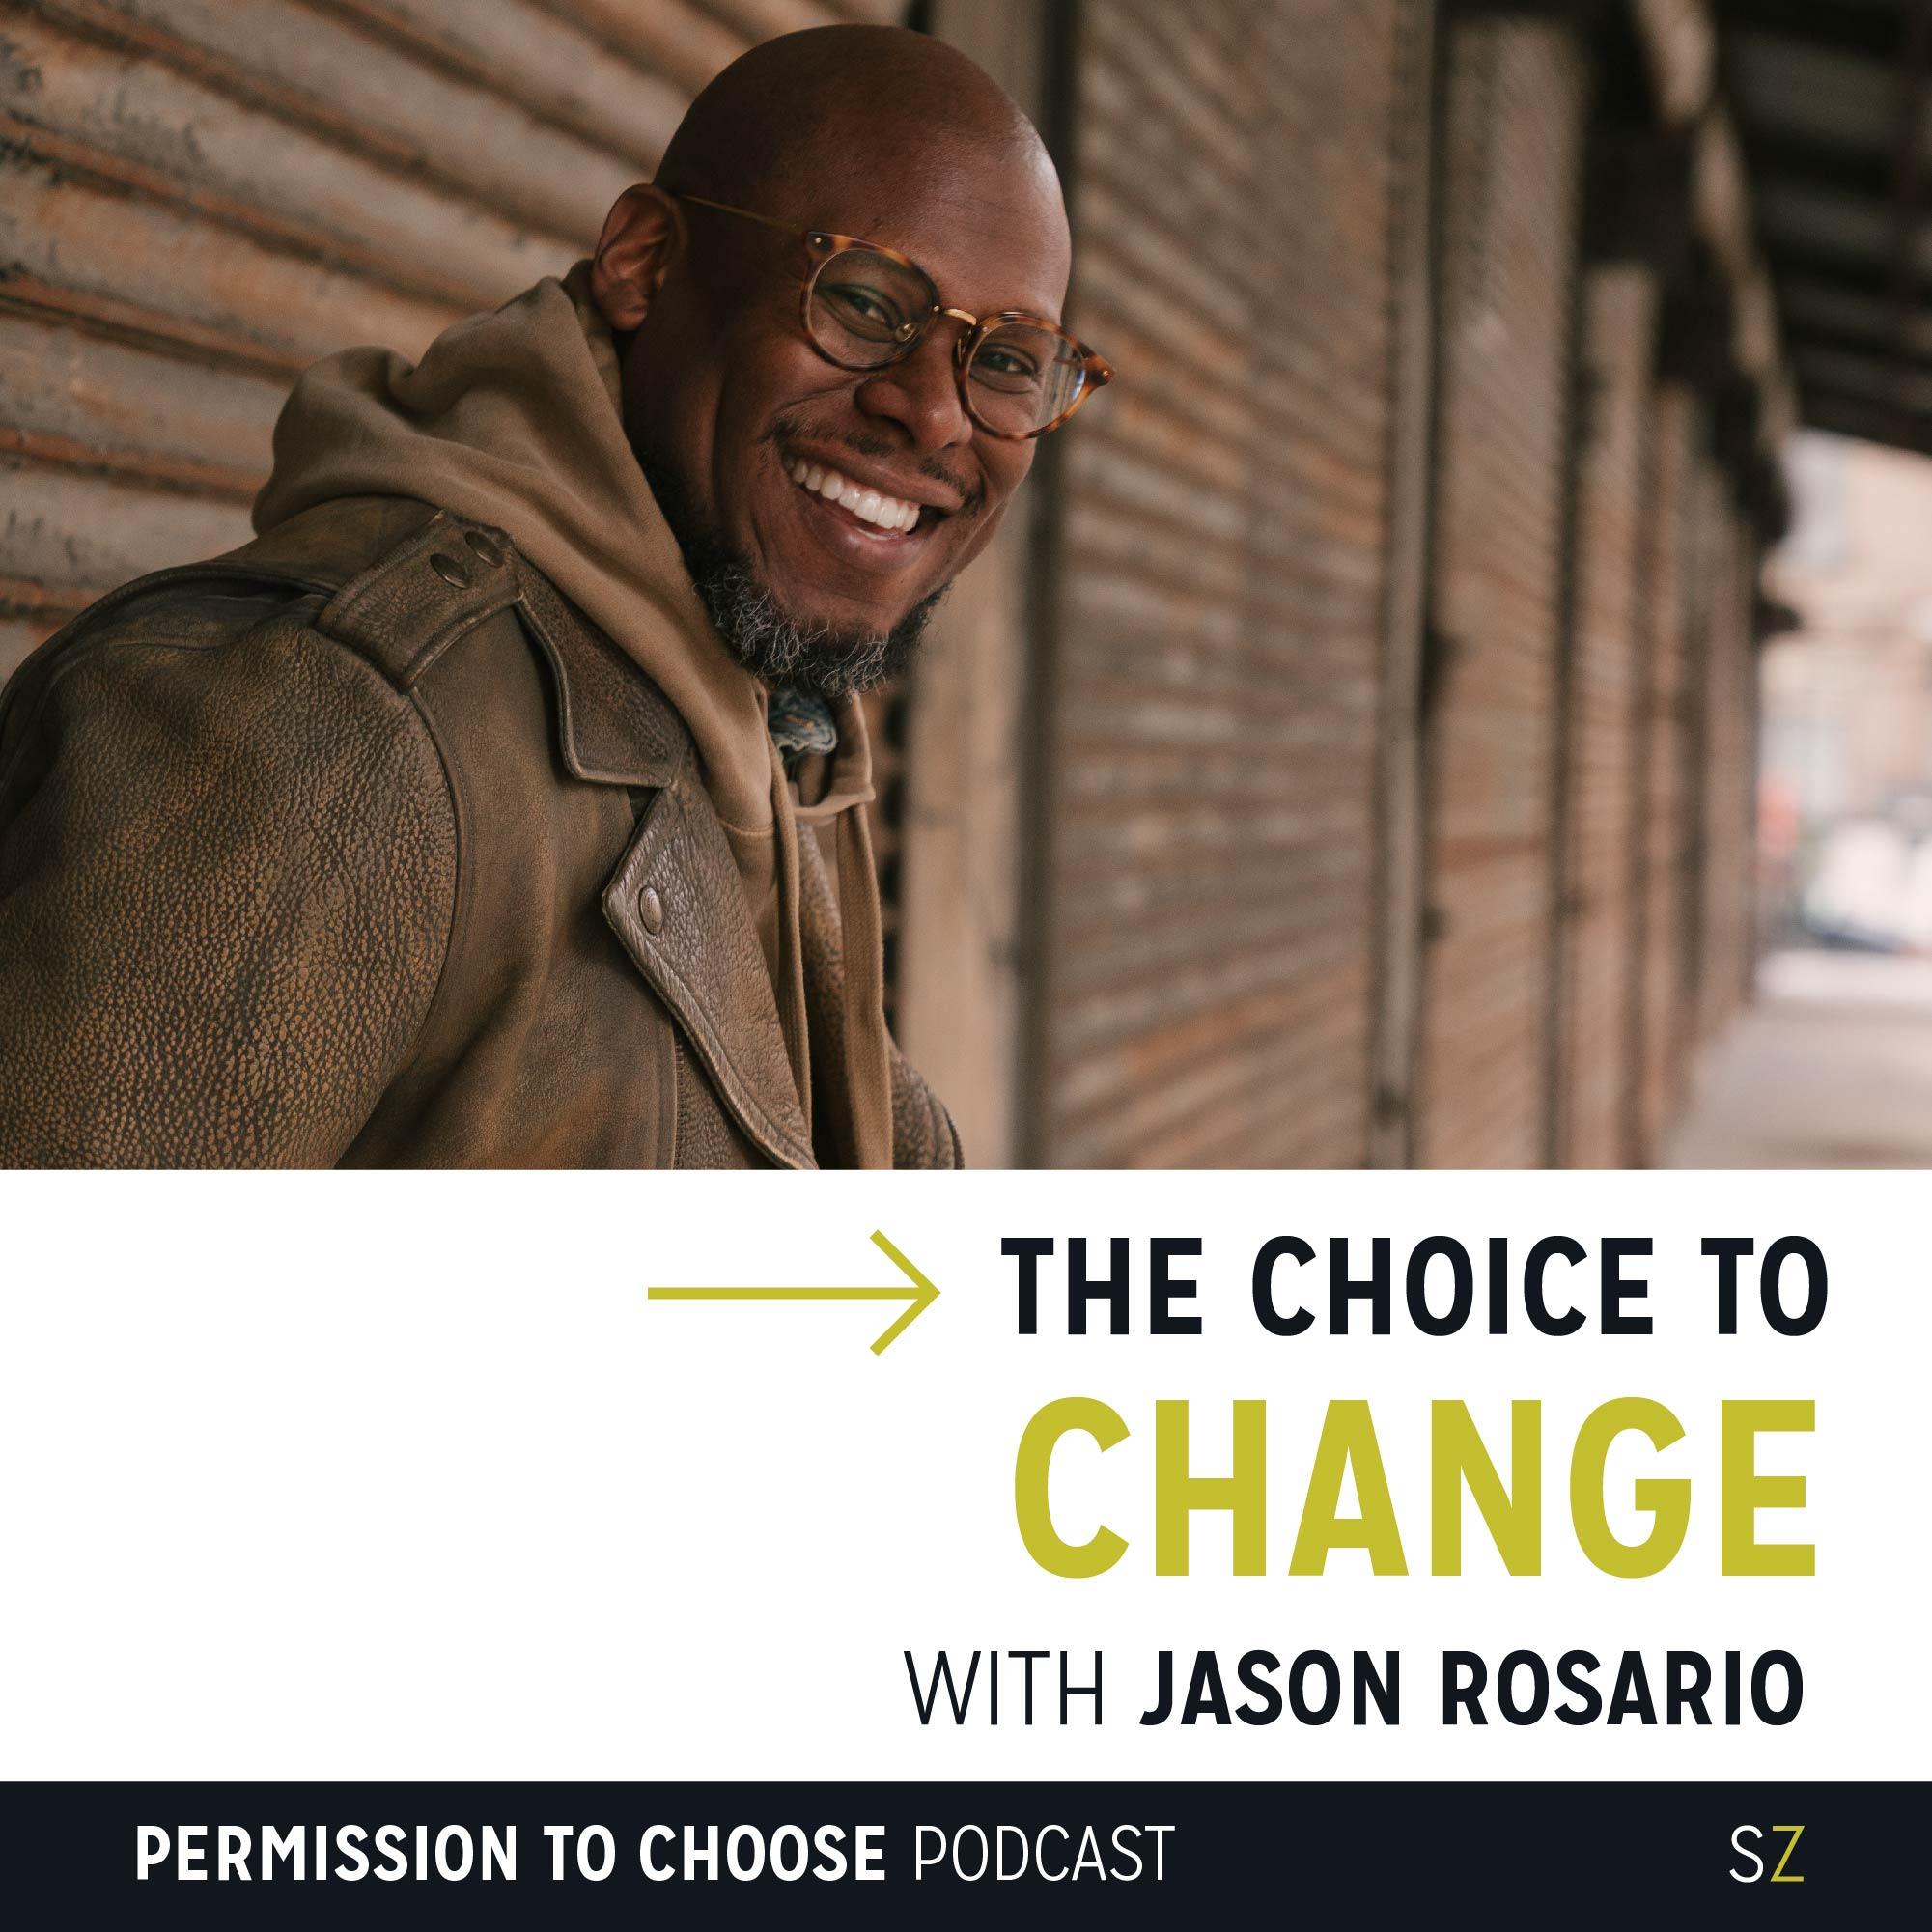 Jason Rosario